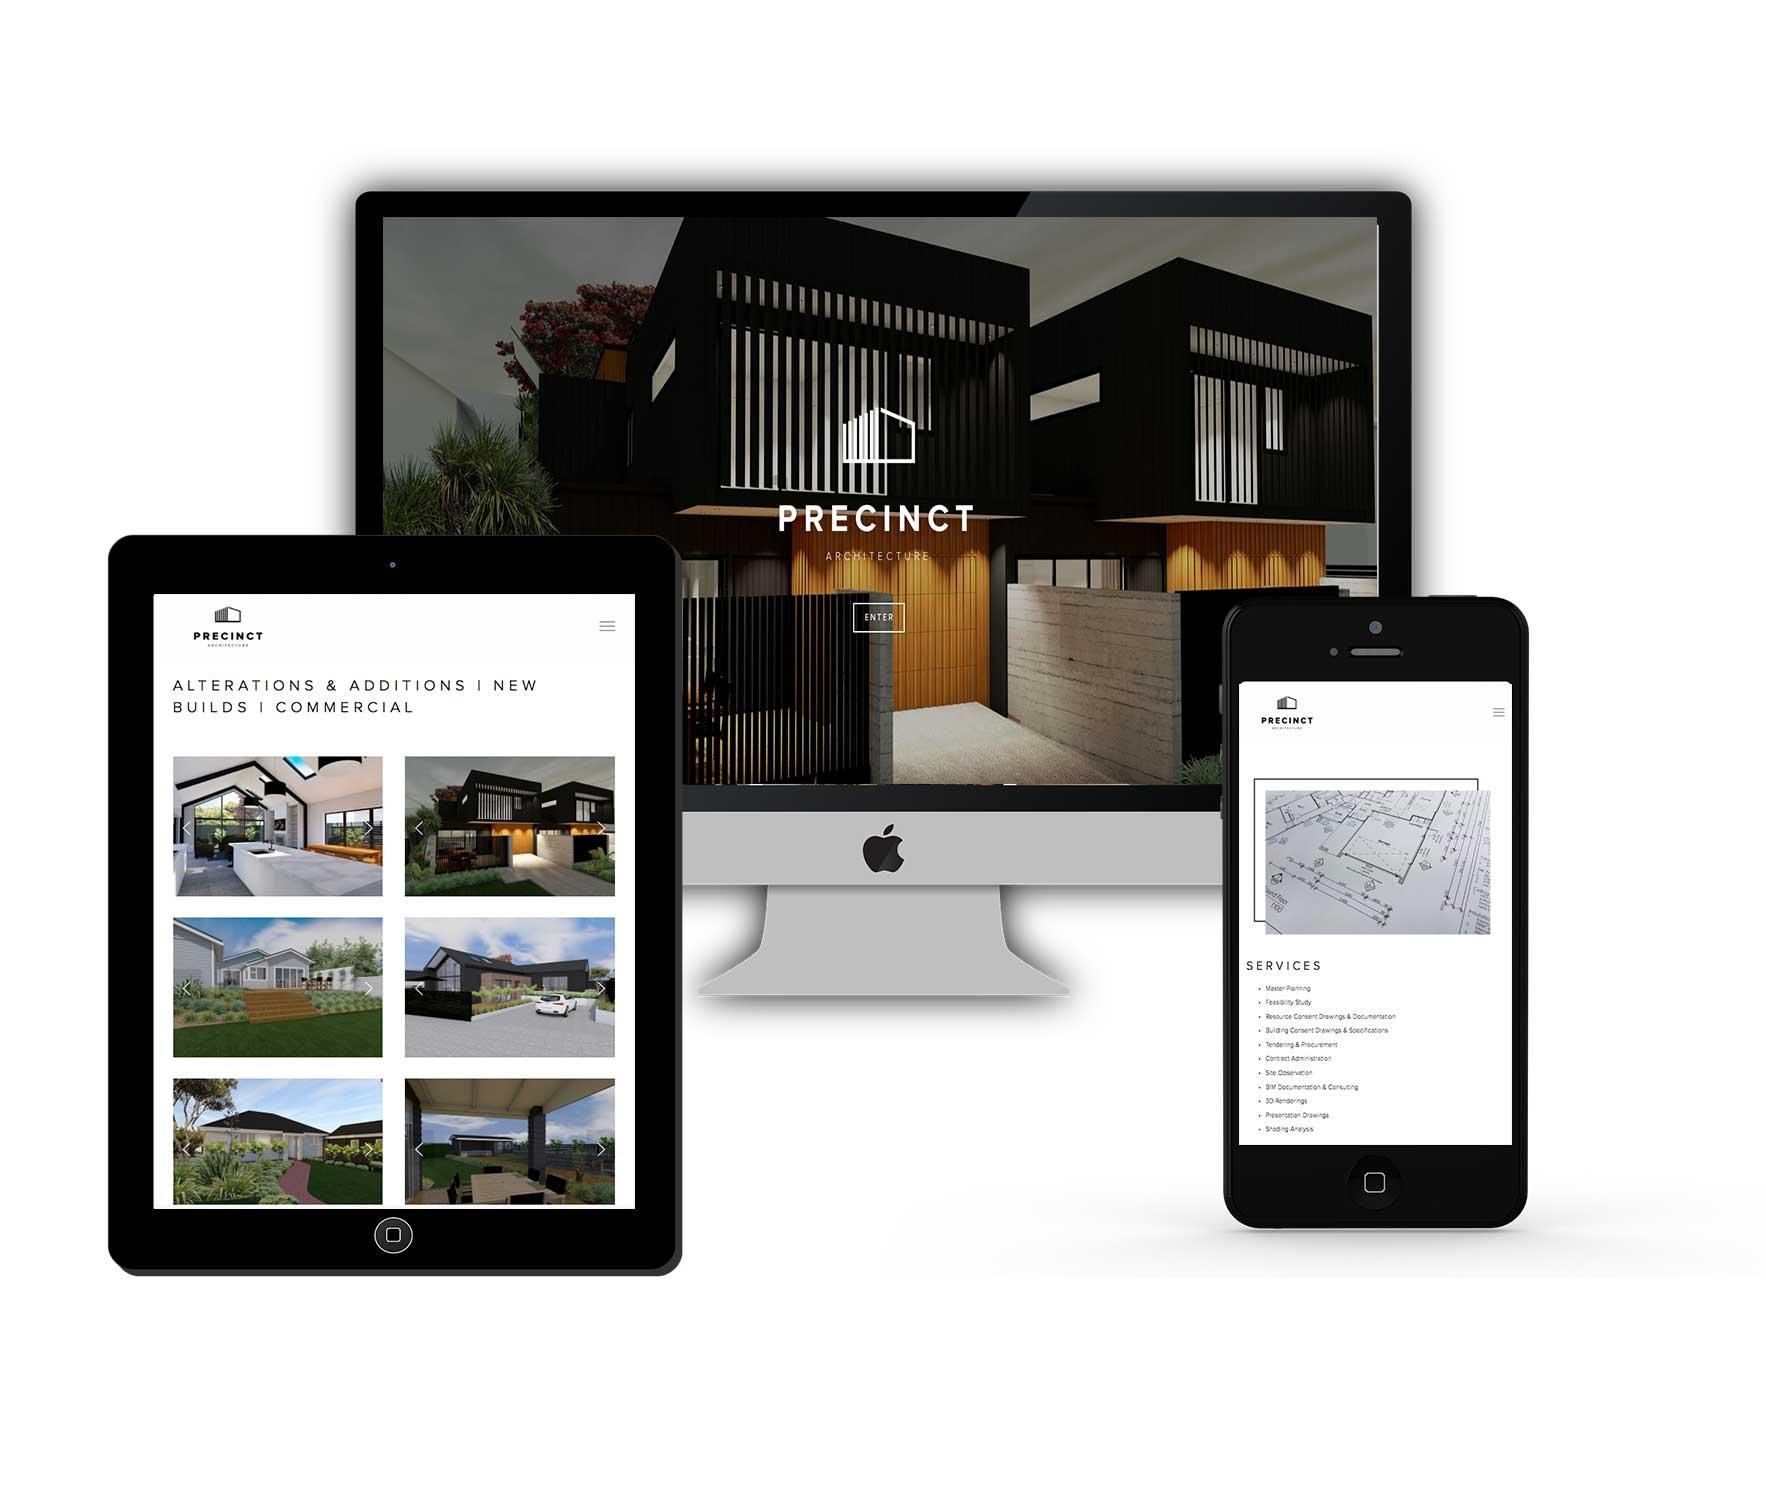 Precinct-Architecture-website-by-Made-By-Markham.jpg